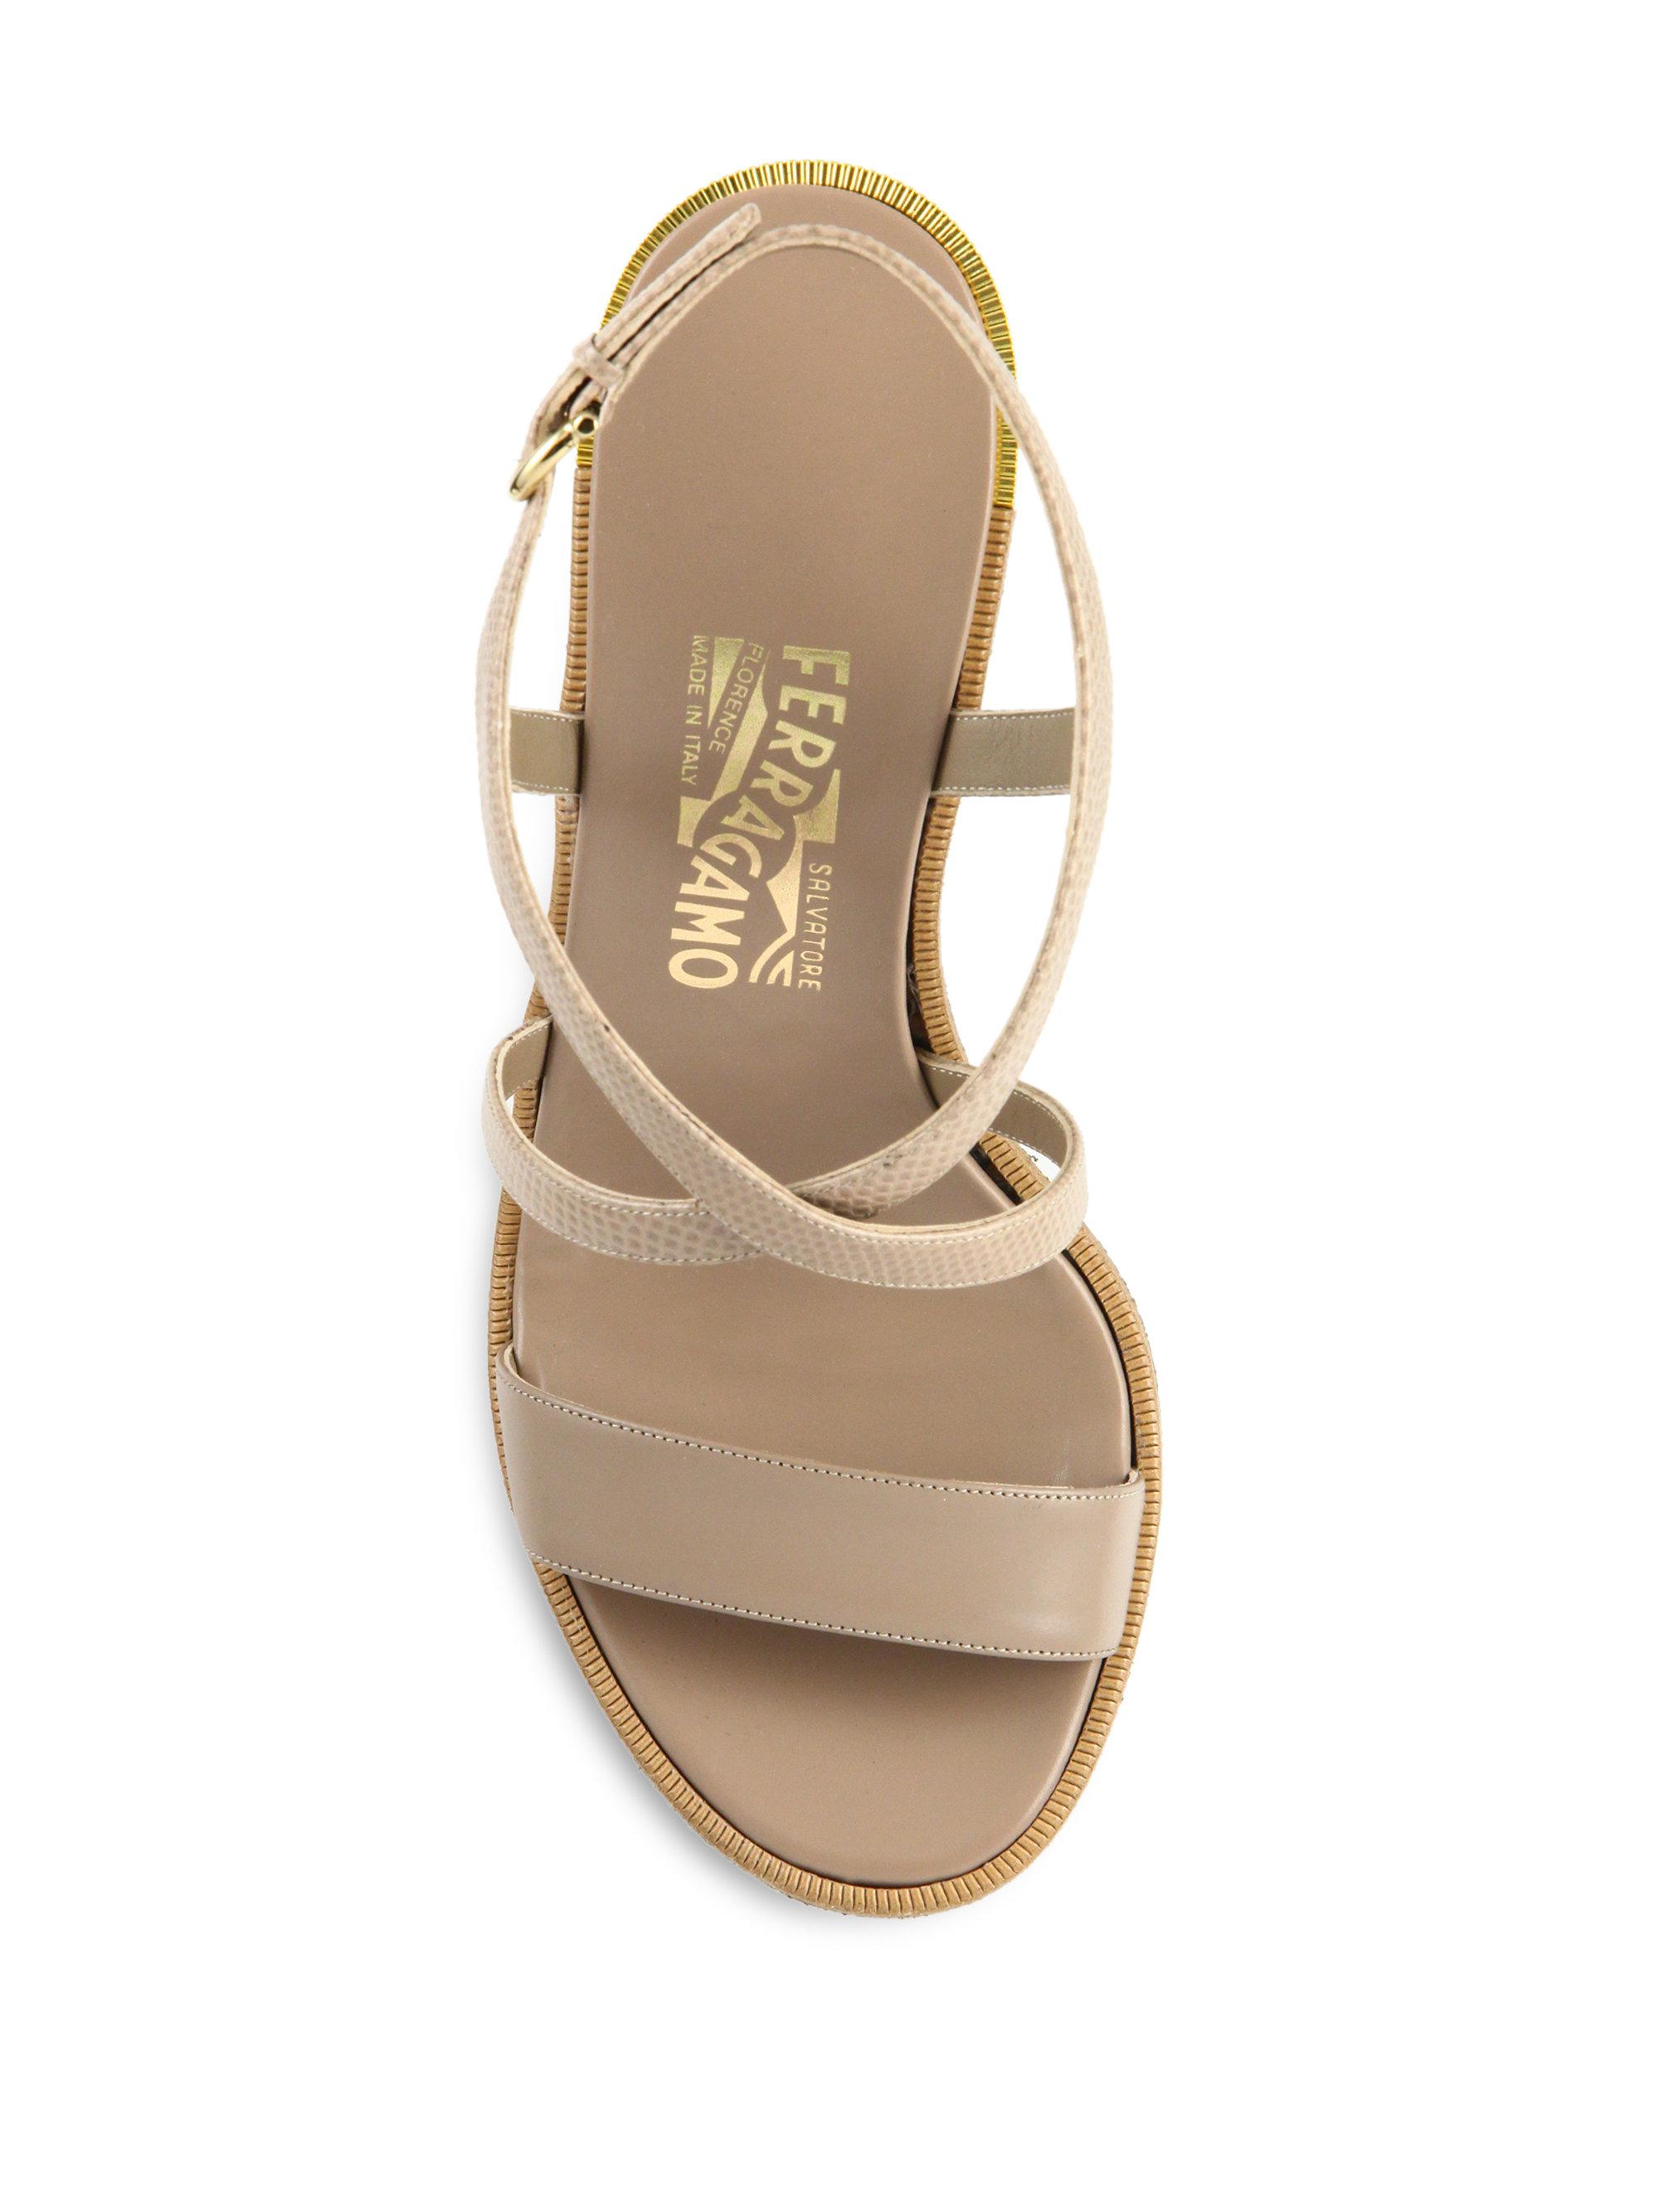 766e325dd128 Lyst - Ferragamo Gina Python-embossed Leather Platform Sandals in ...